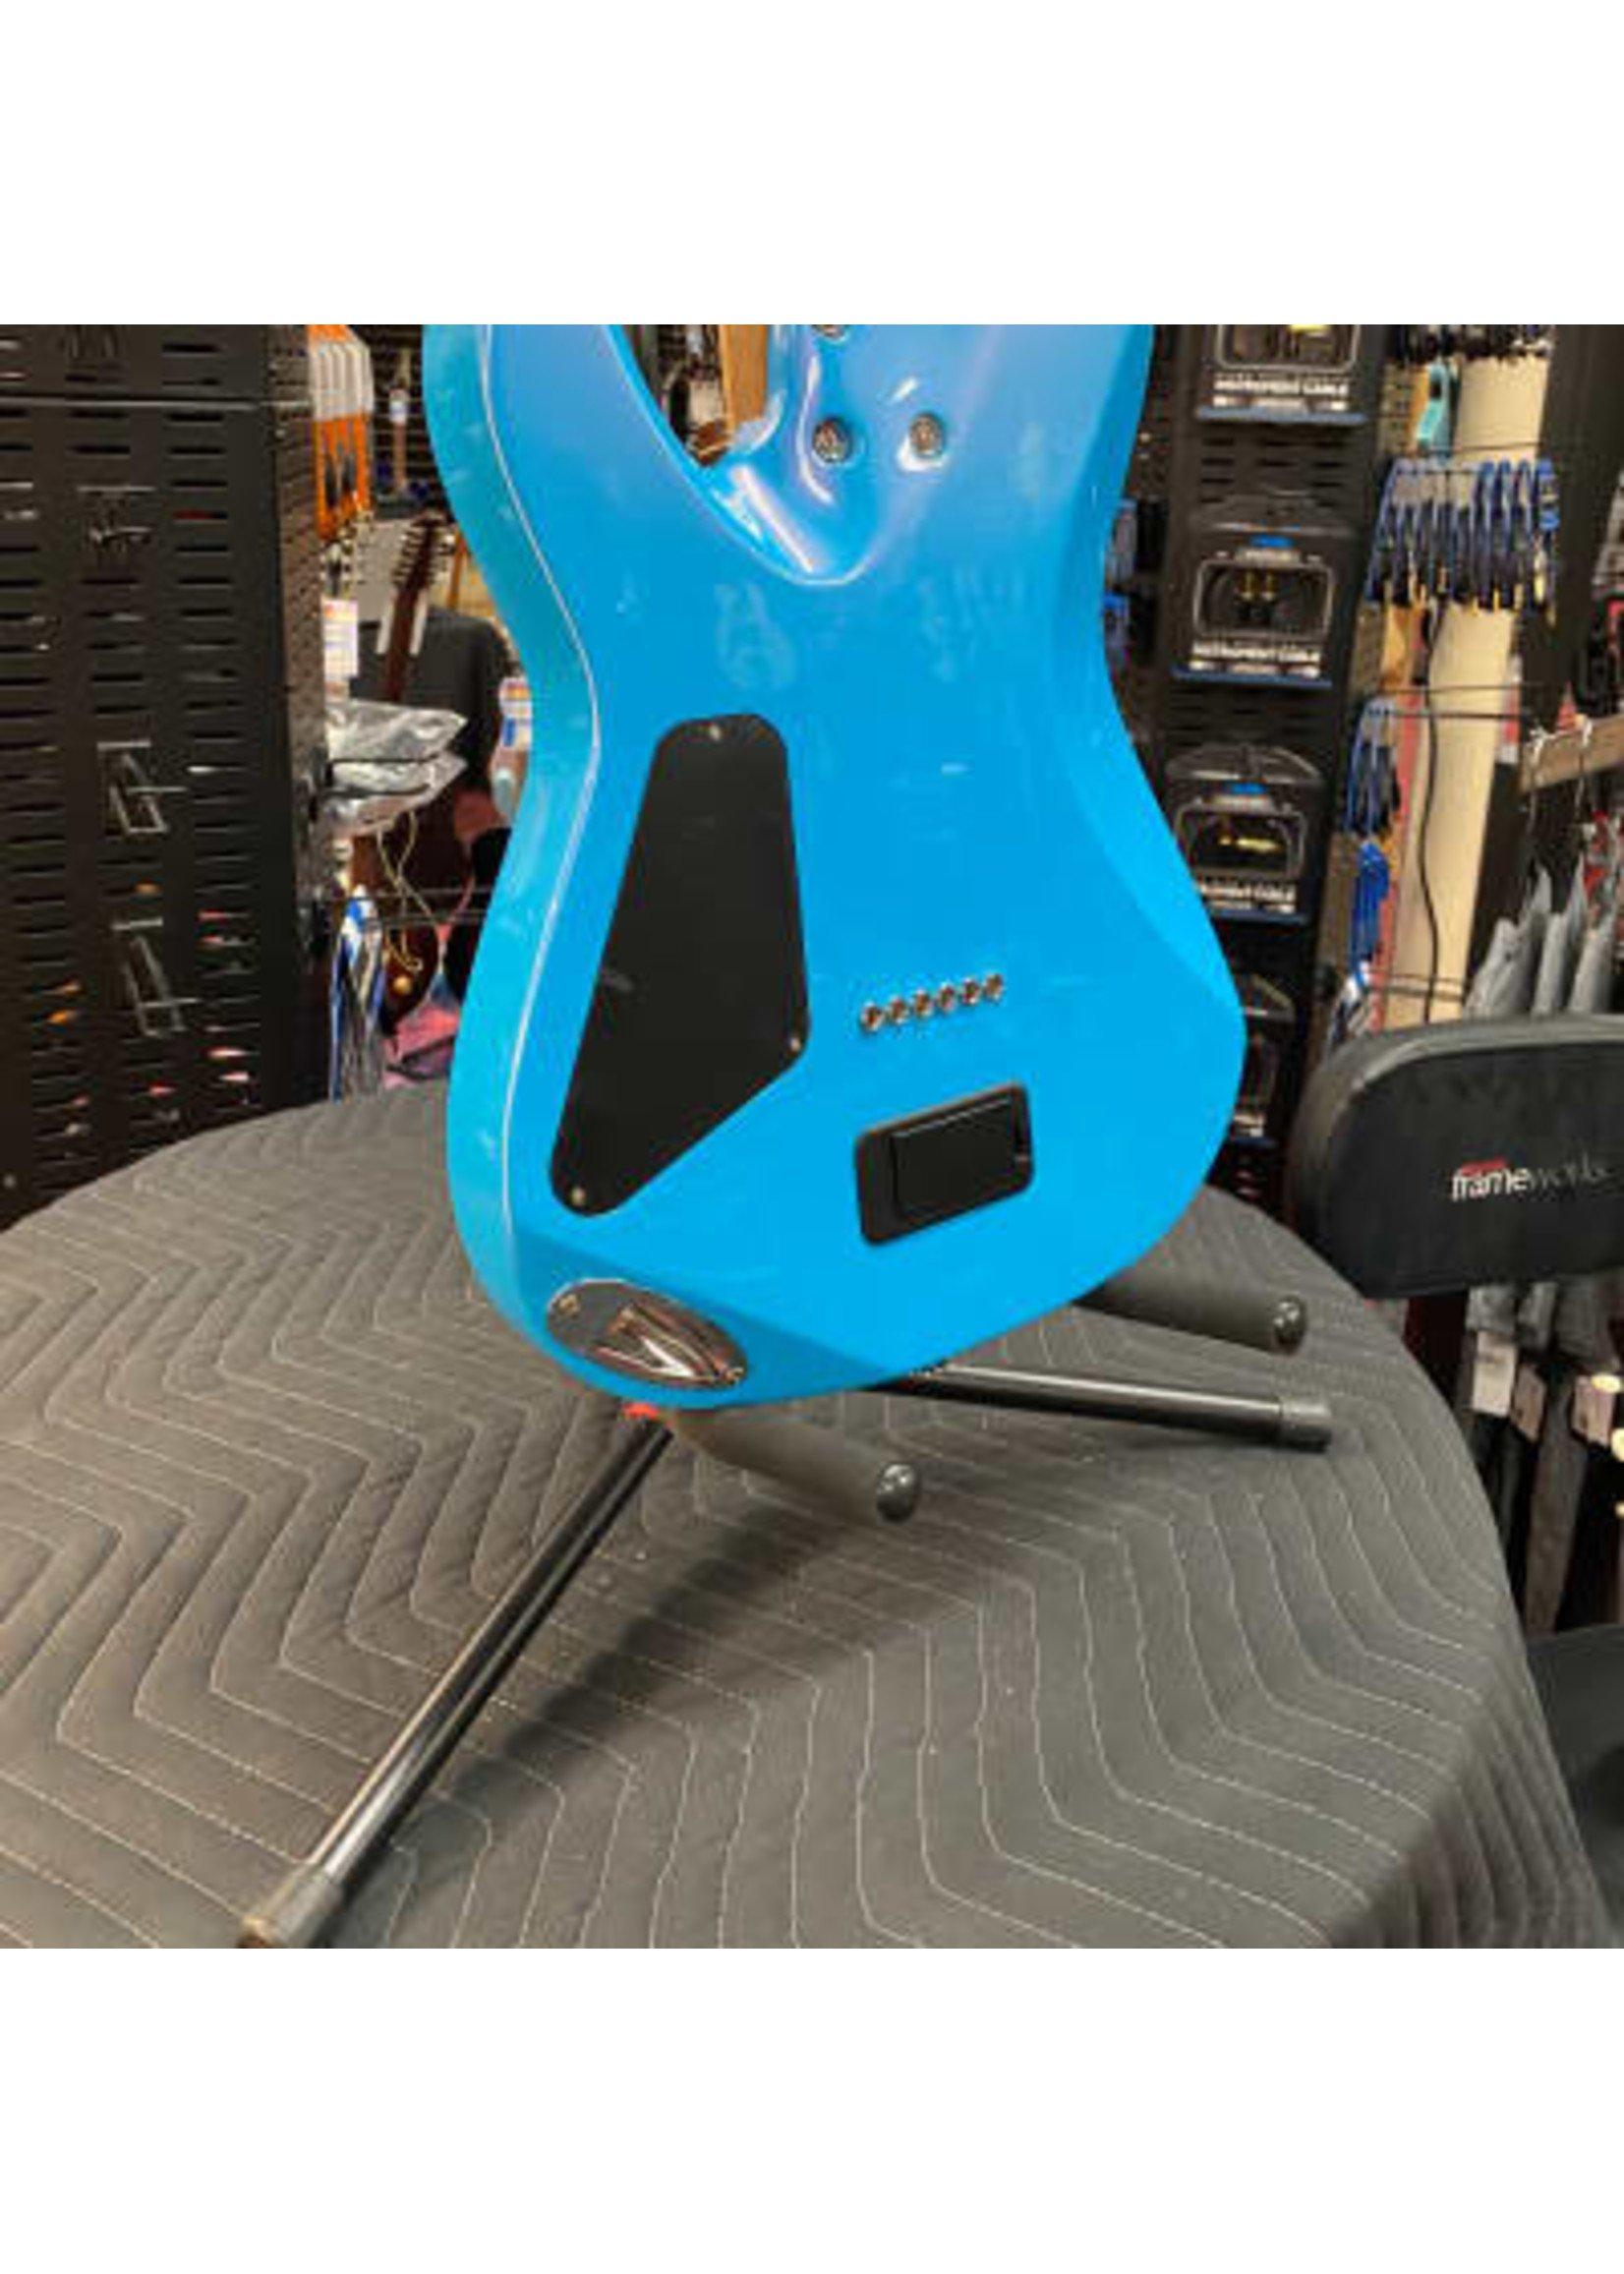 Charvel Charvel Pro-Mod So-Cal Style 2 24 HH HT CM, Caramelized Maple Fingerboard, Robin's Egg Blue